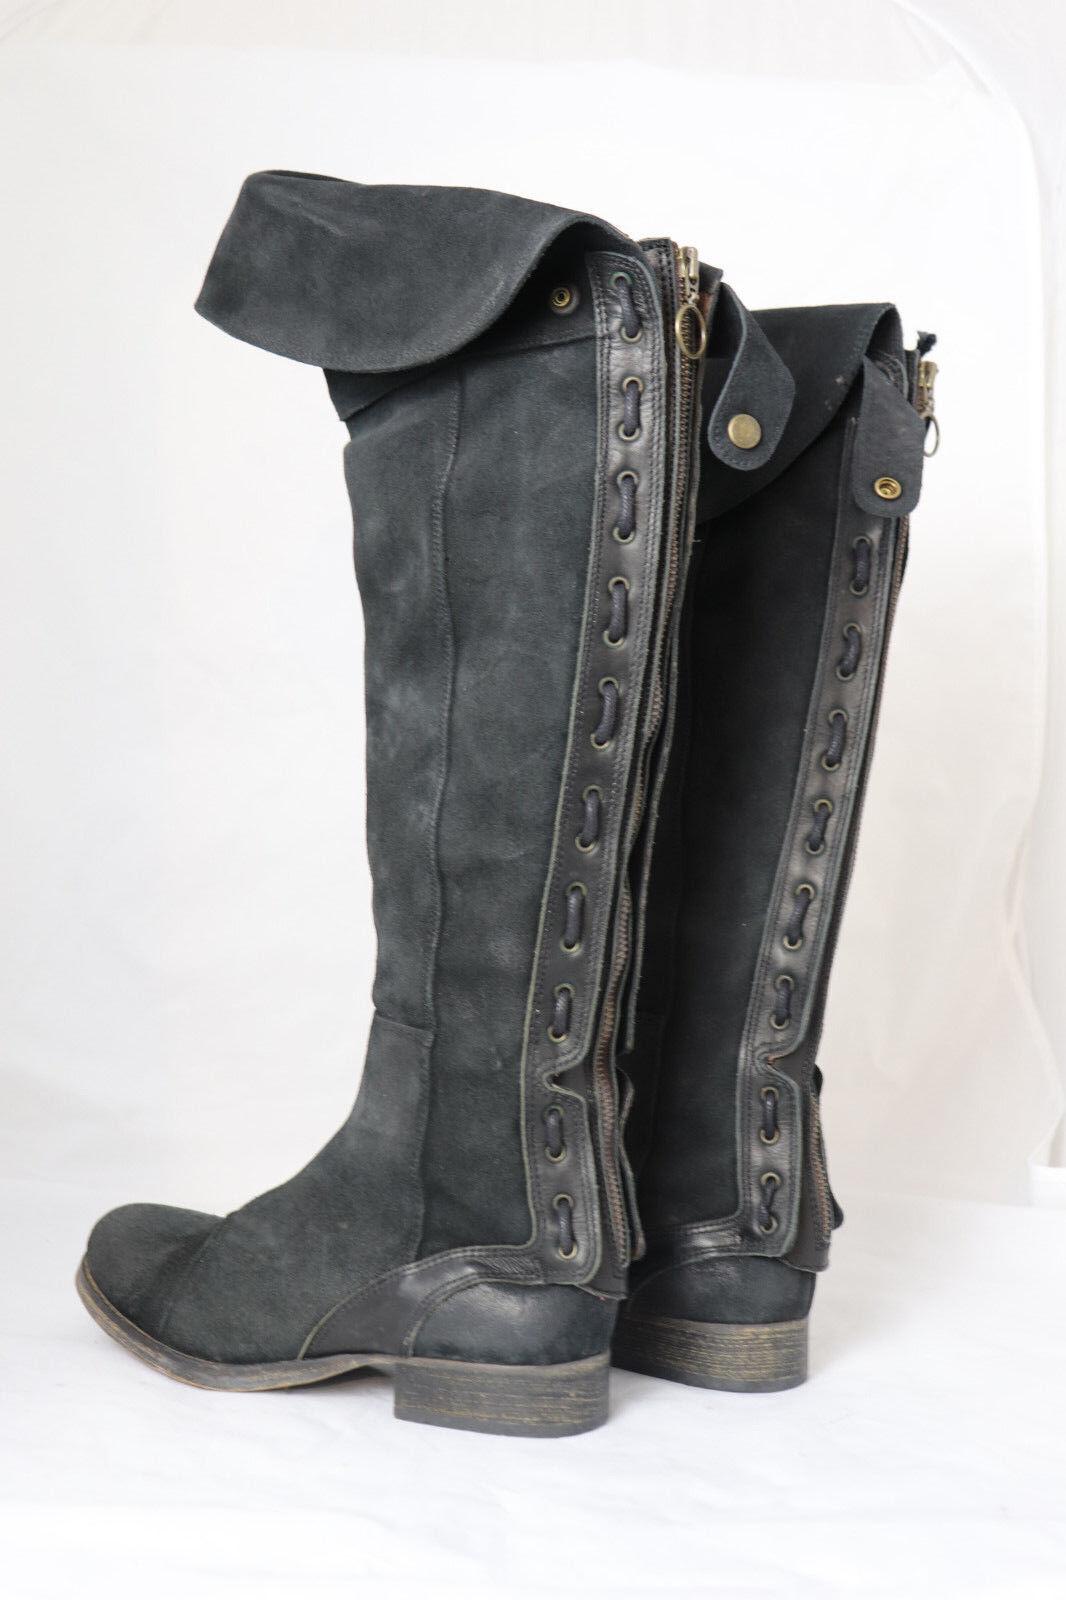 Xyxyx Stiefel Langschaft overknees schwarz Leder neu 37